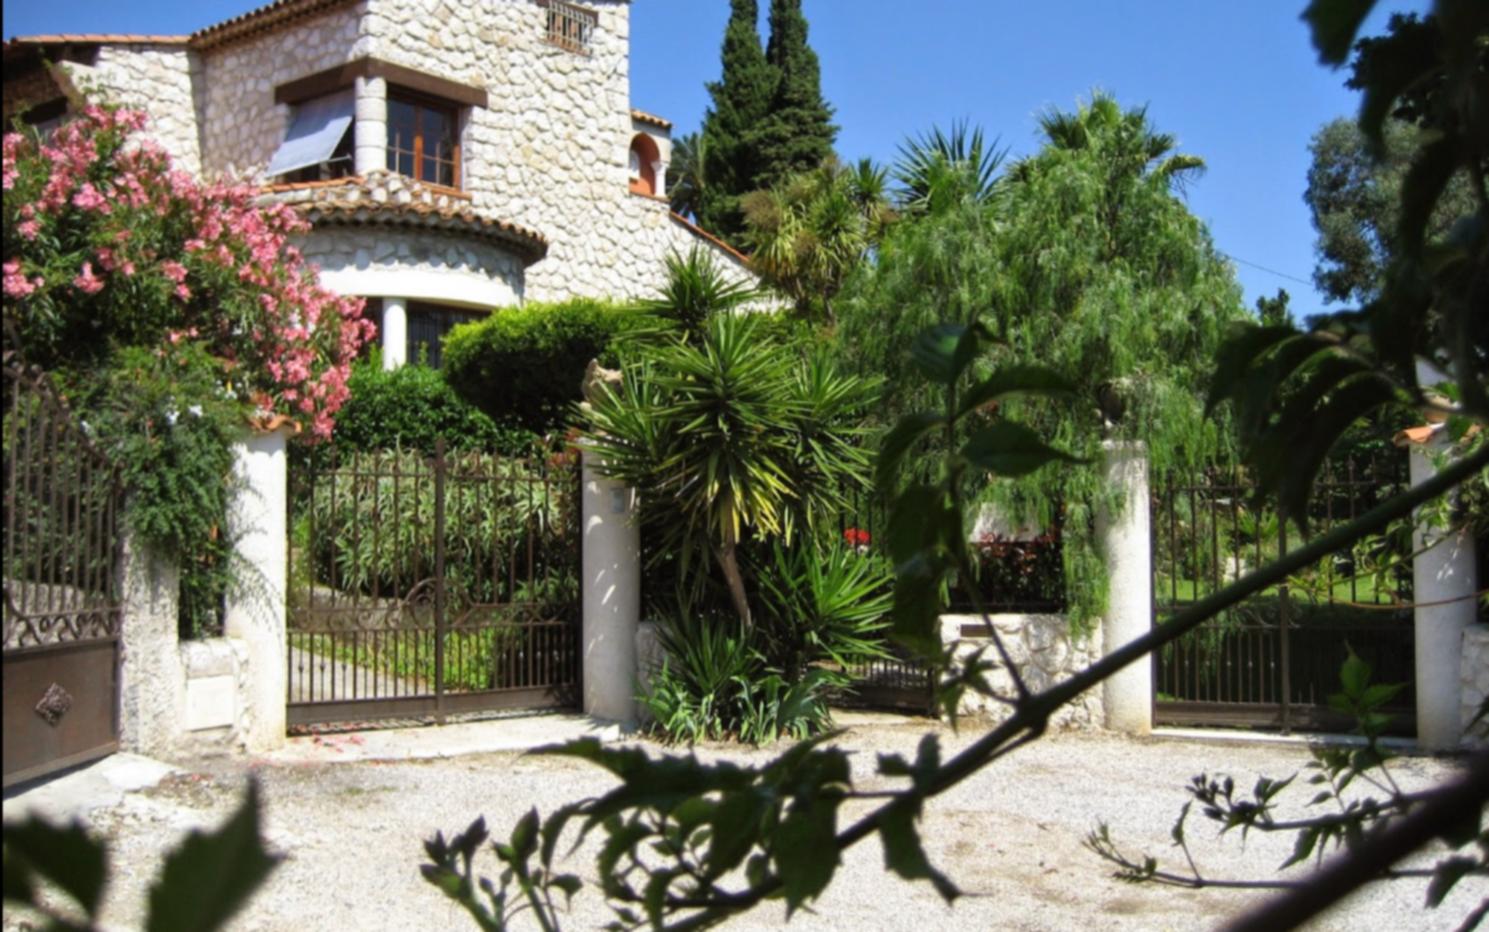 A tree in front of a building at La Magaloun Chambre d'hôtes.